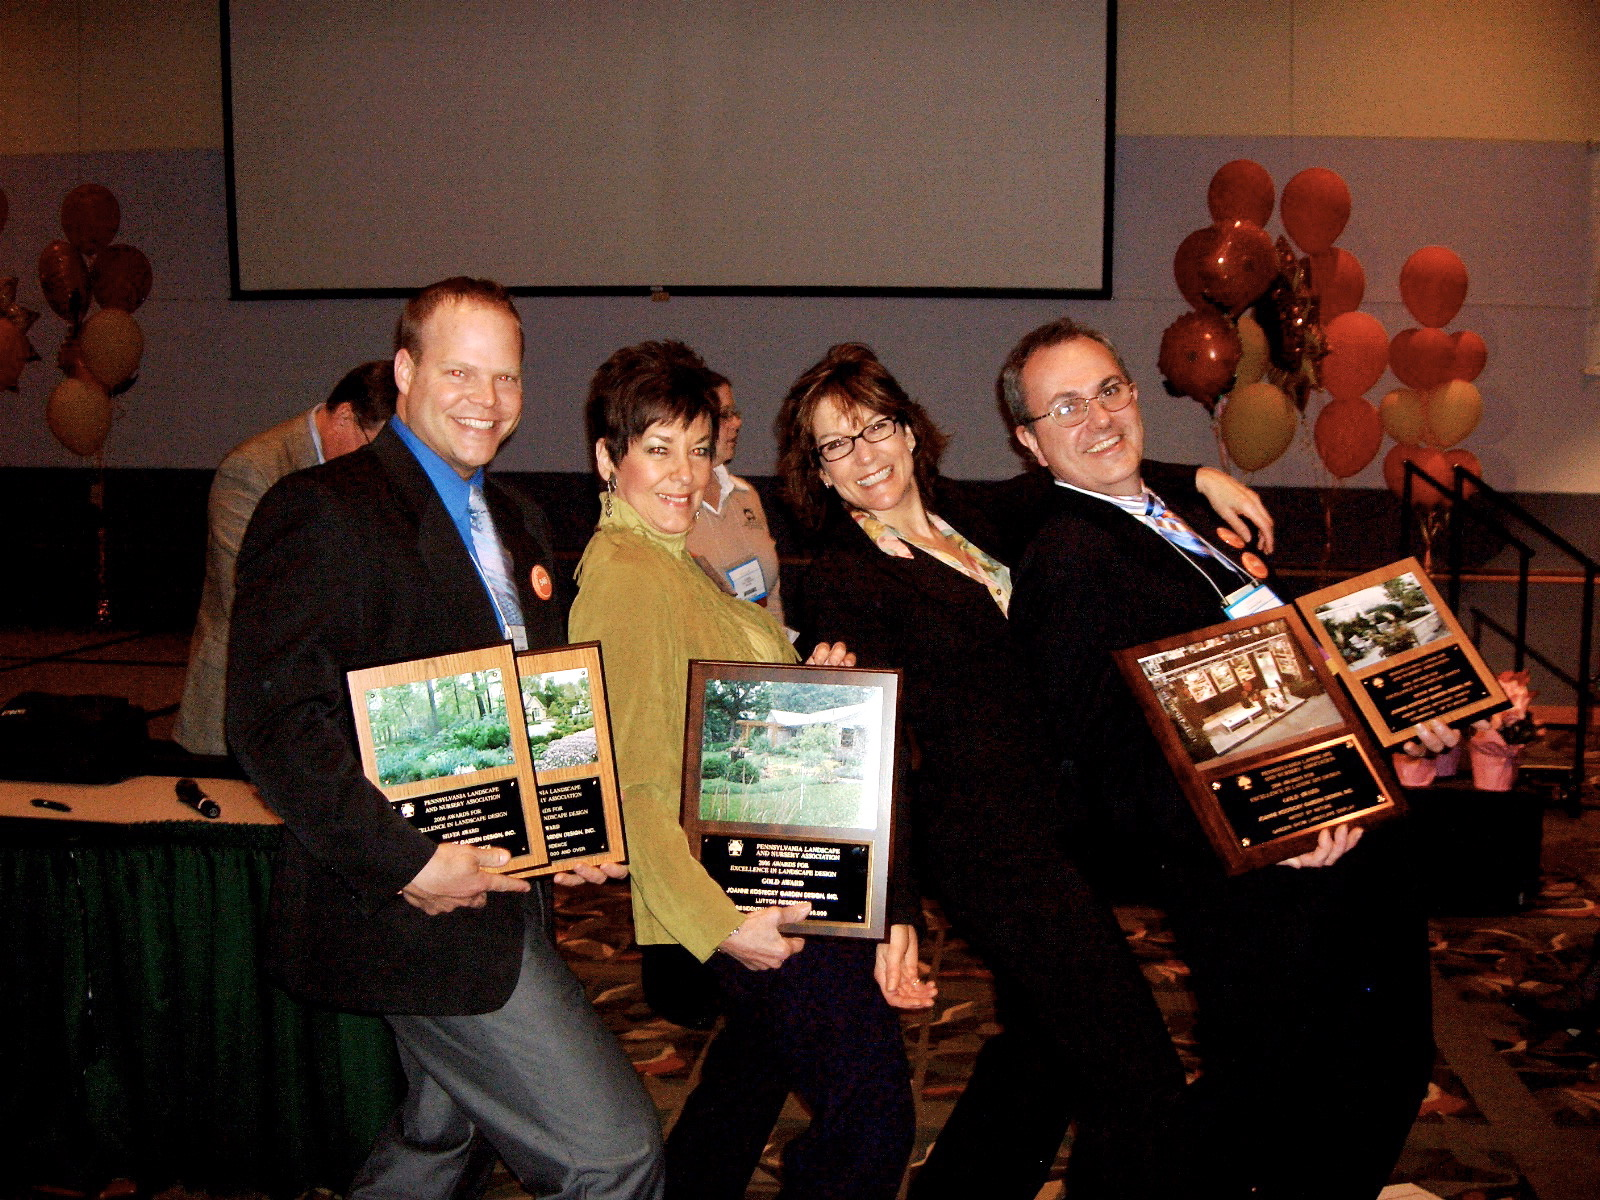 Four happy award winners